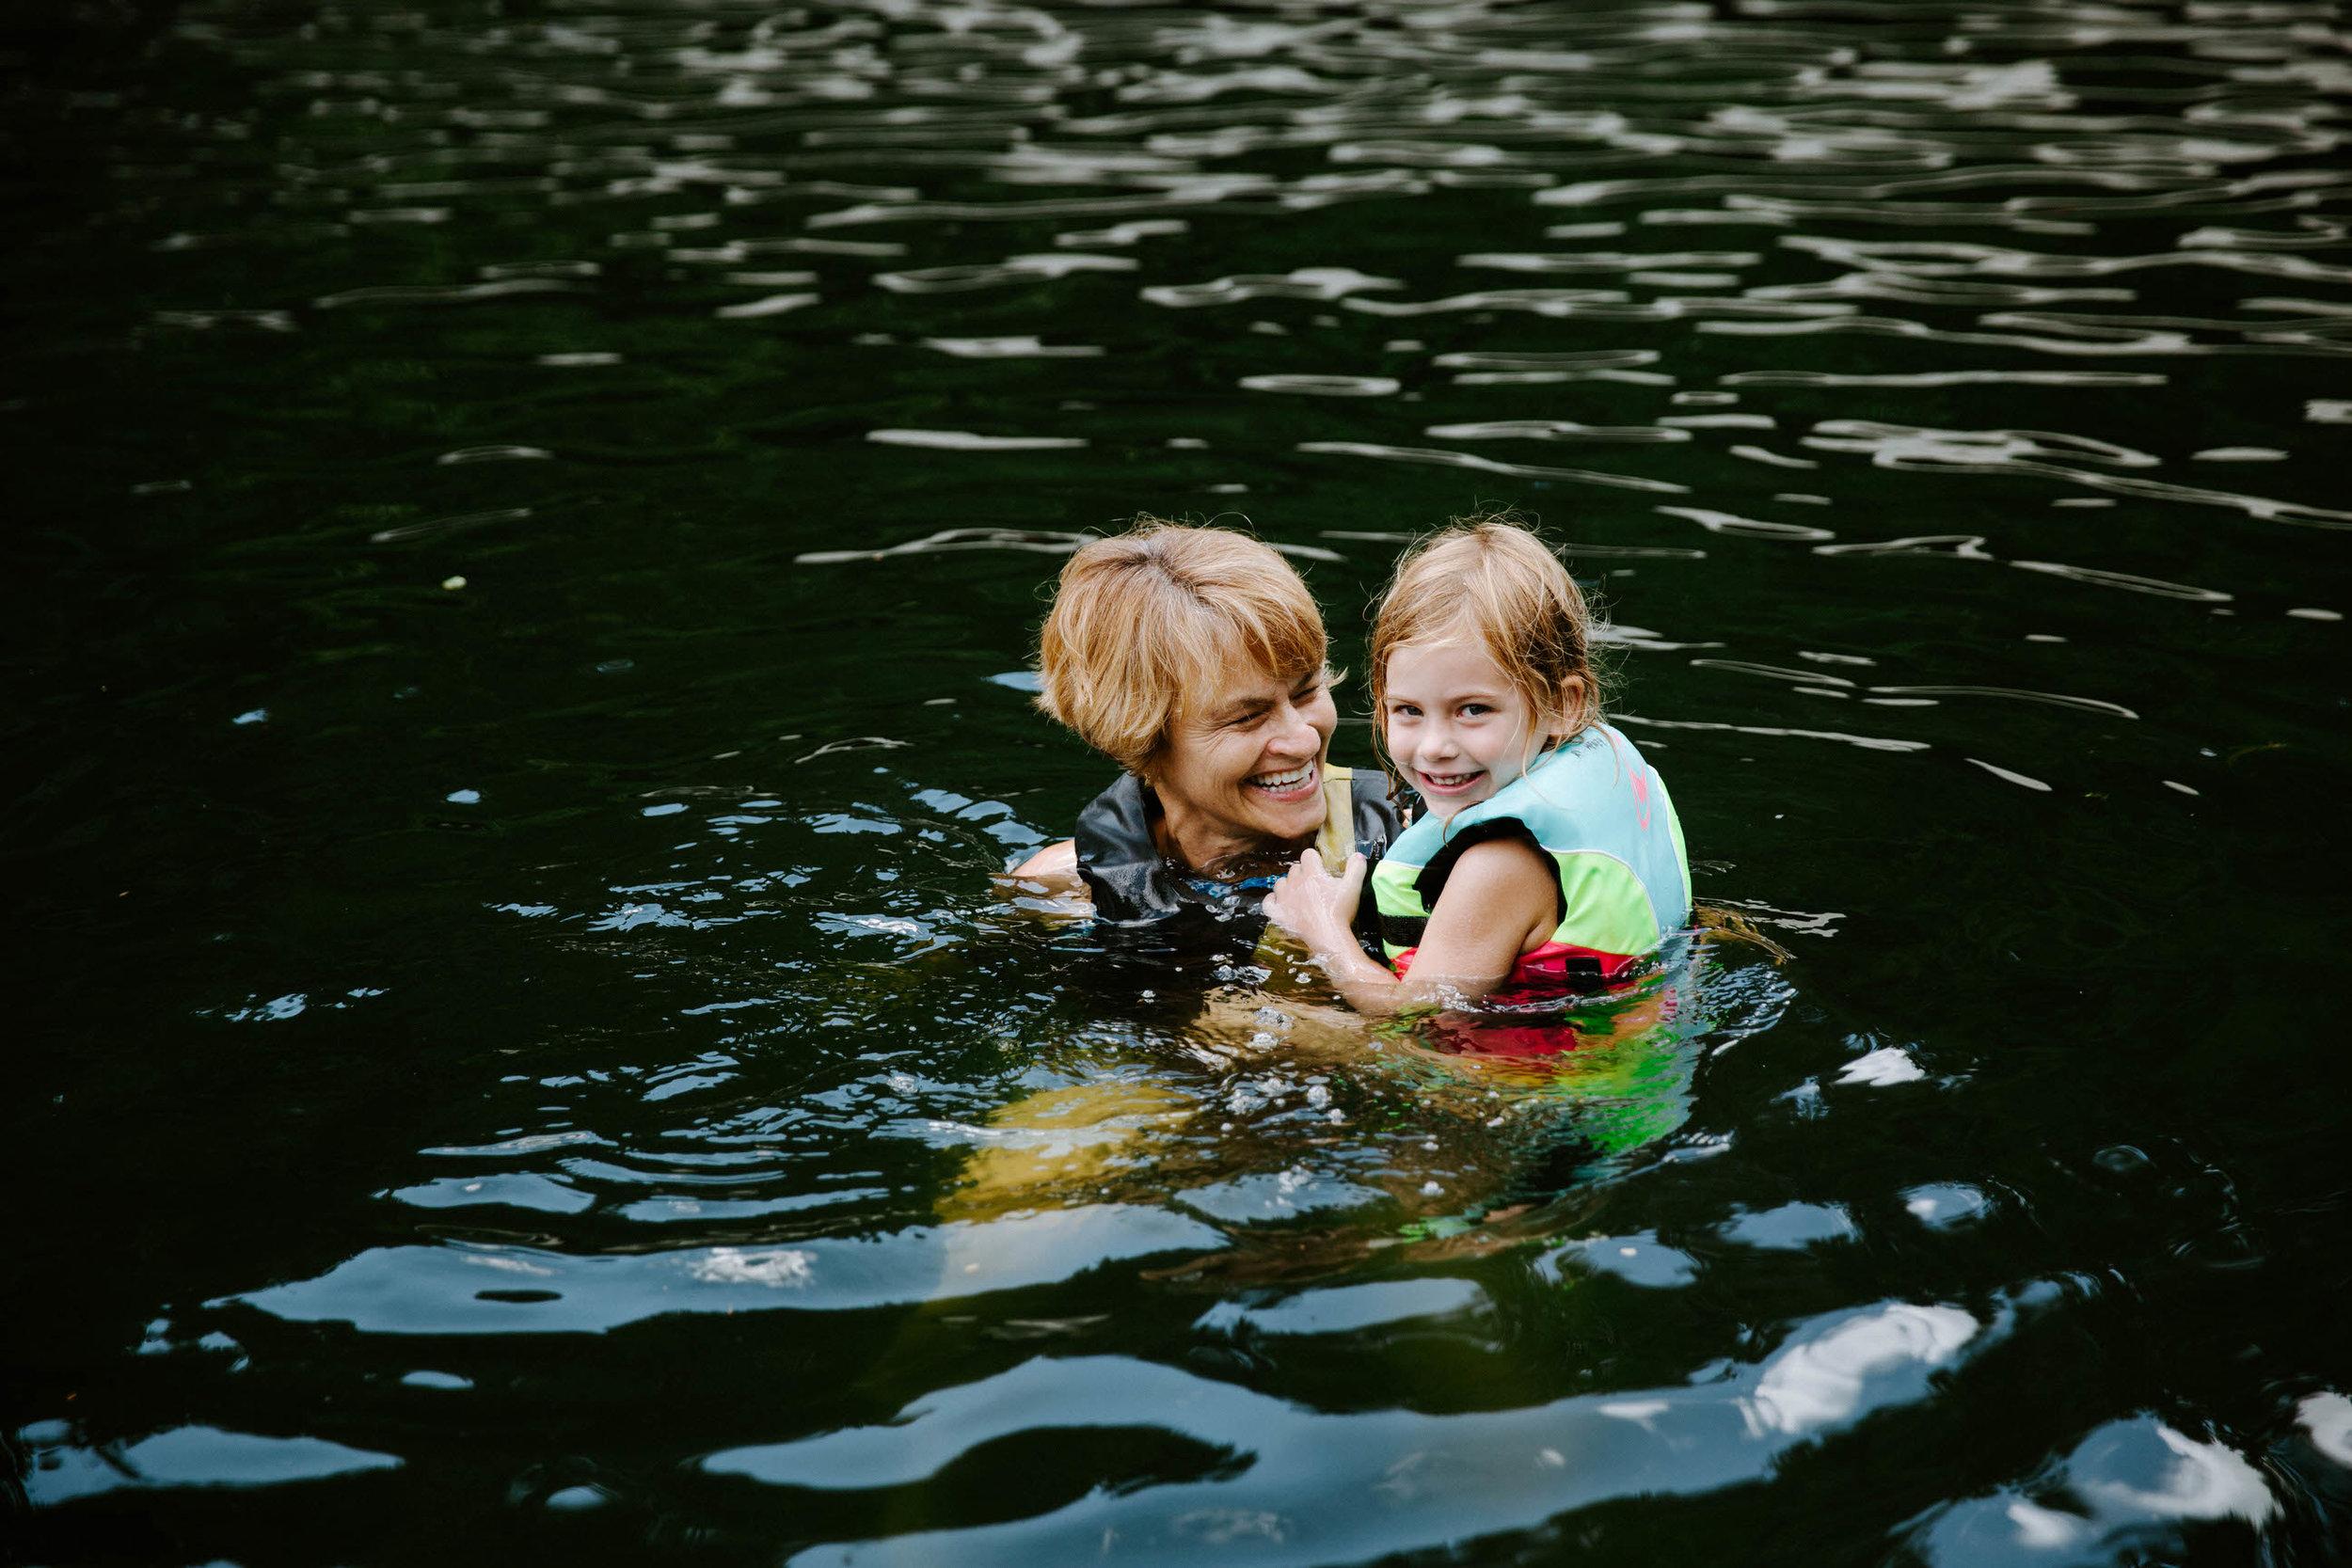 jeremy+elle-Lake-0701.jpg